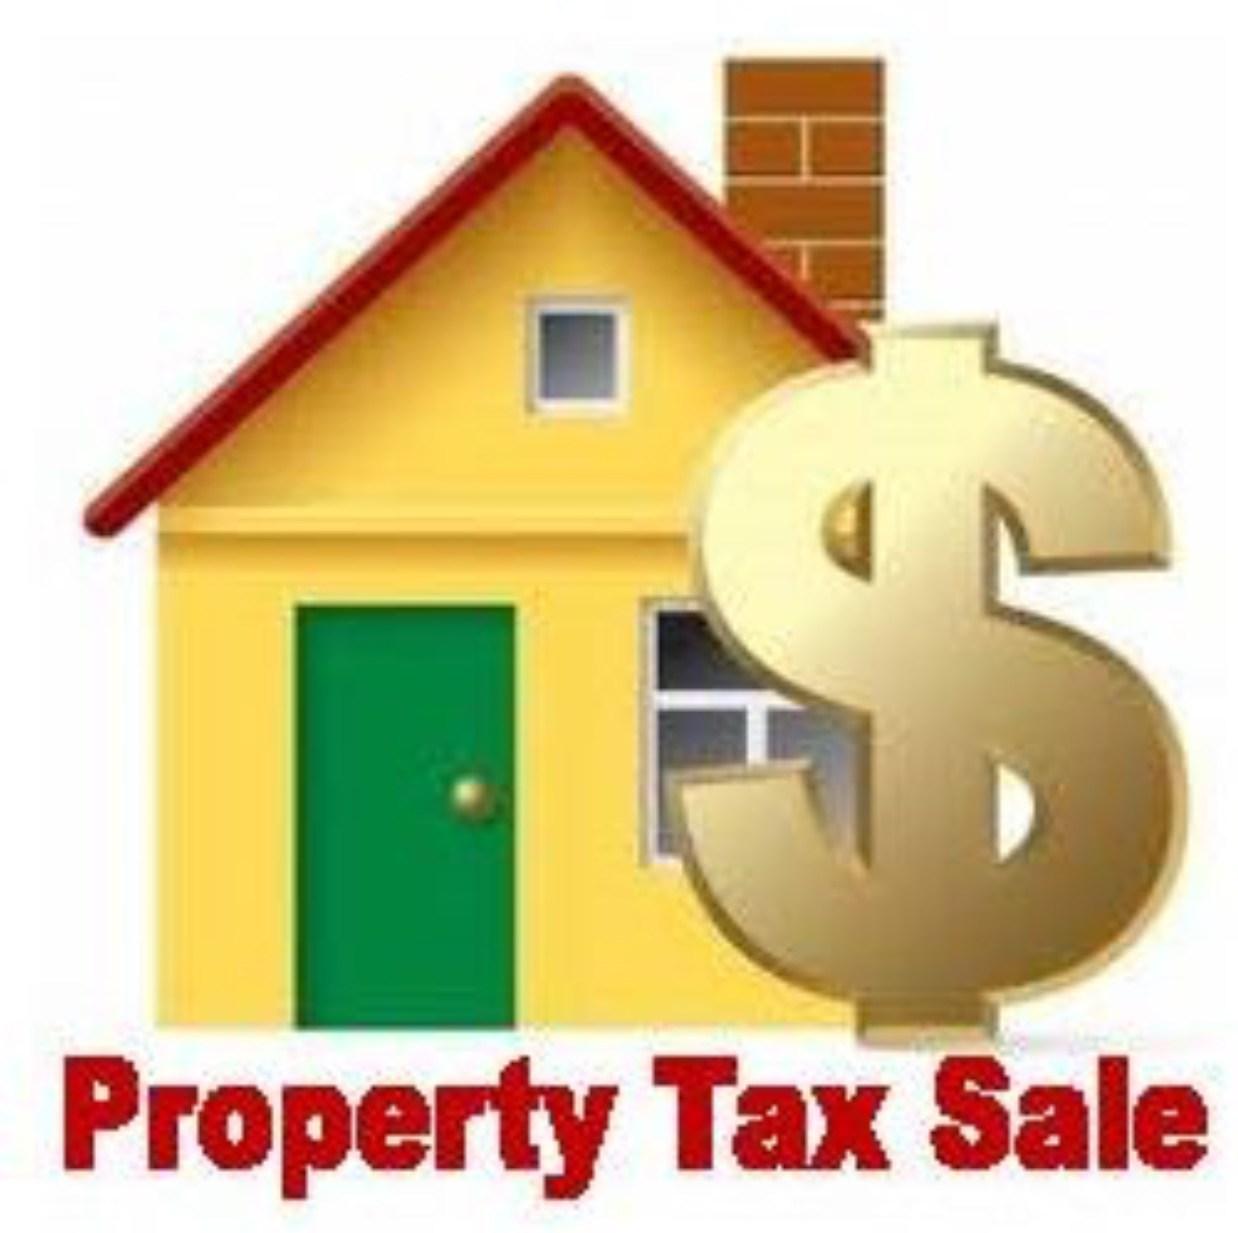 Pineville, LA / Property Tax Sale